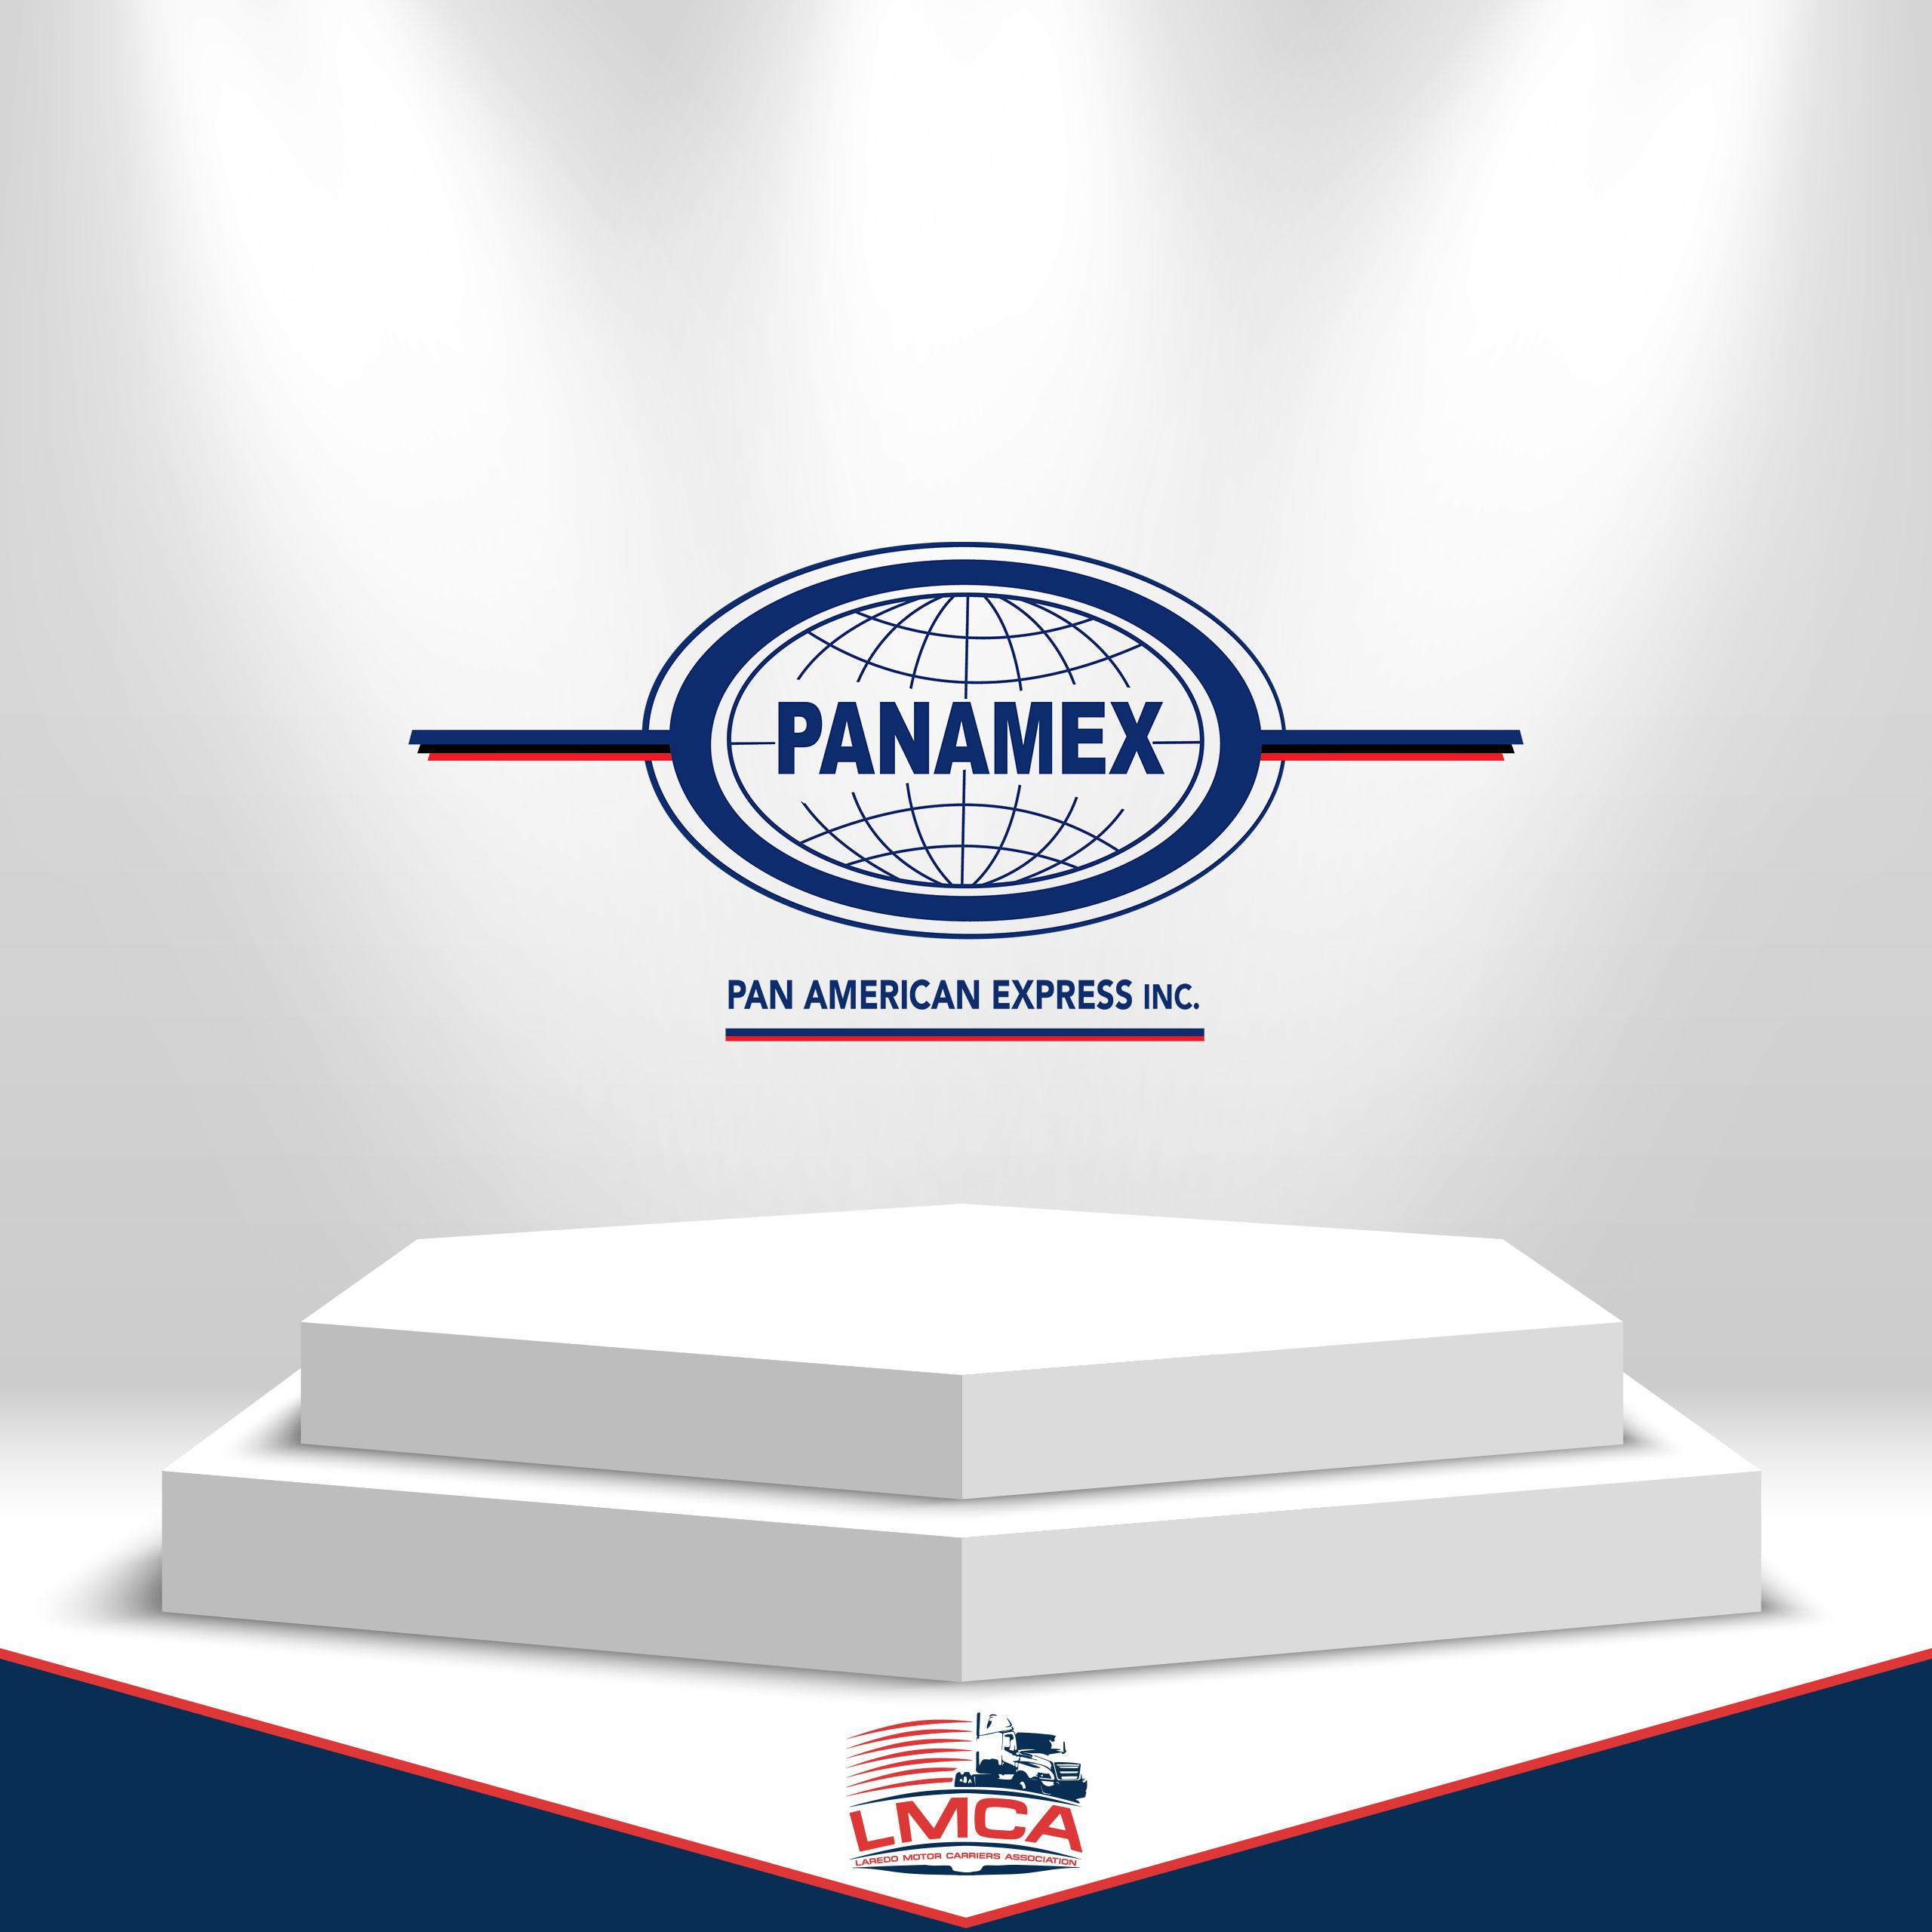 PANAMEX-LMCA